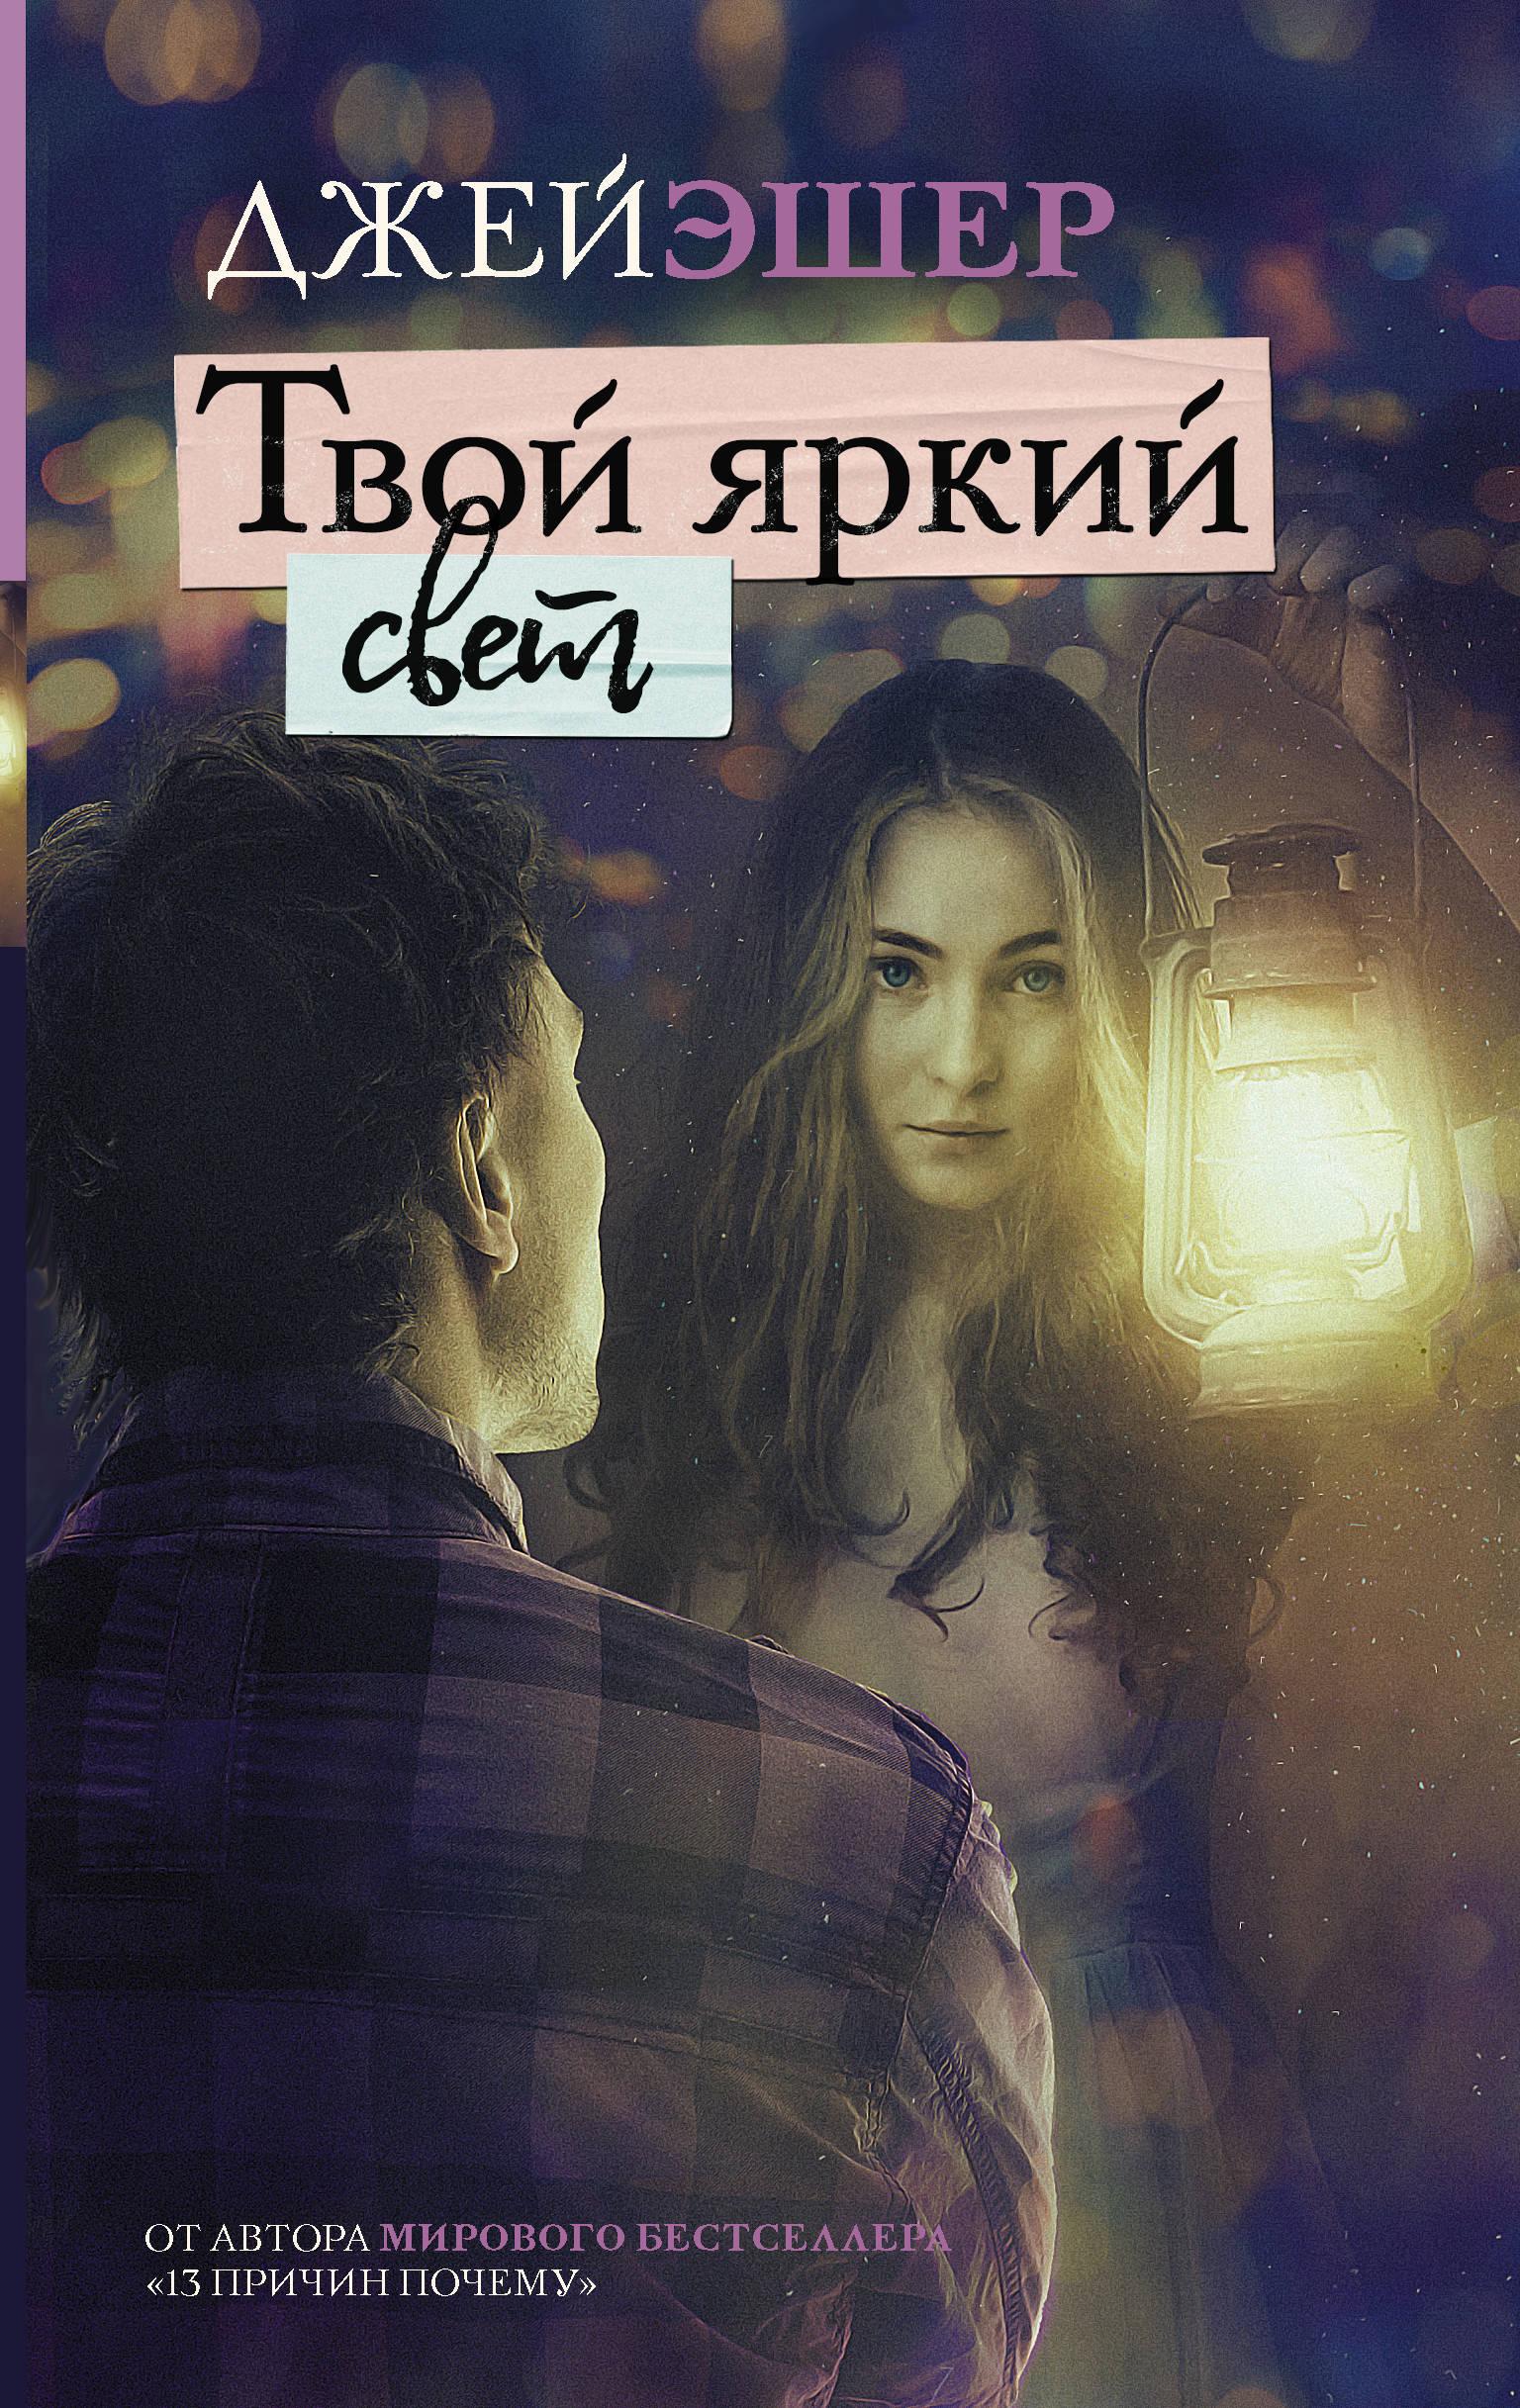 Эшер Джей Твой яркий свет ISBN: 978-5-17-109600-7